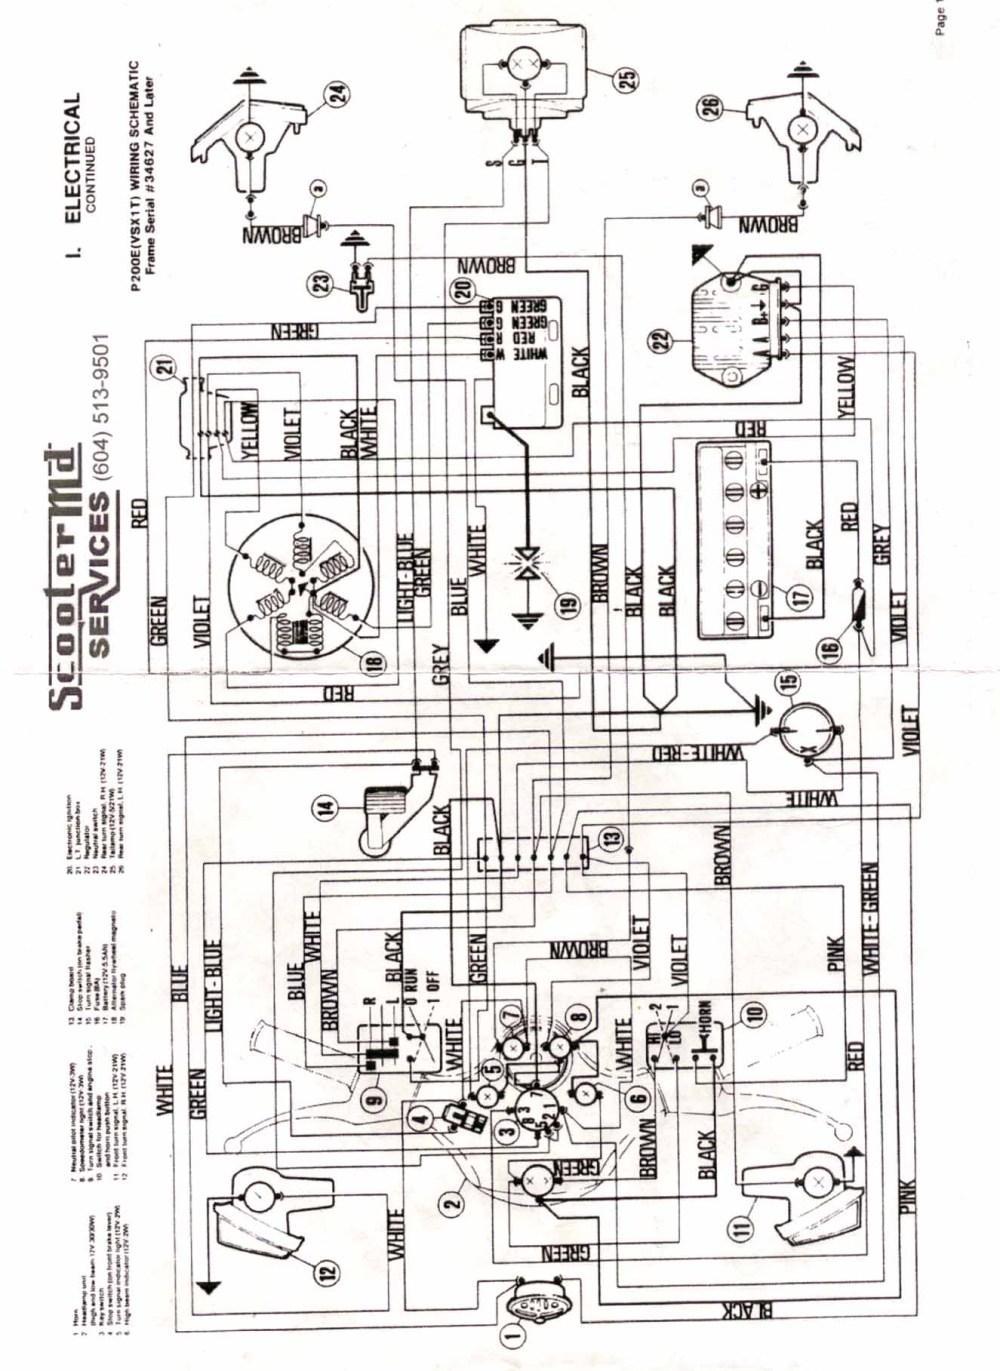 medium resolution of wiring diagram vespa p150x free wiring diagram for you u2022 vespa p200e wiring diagram get free image about wiring diagram